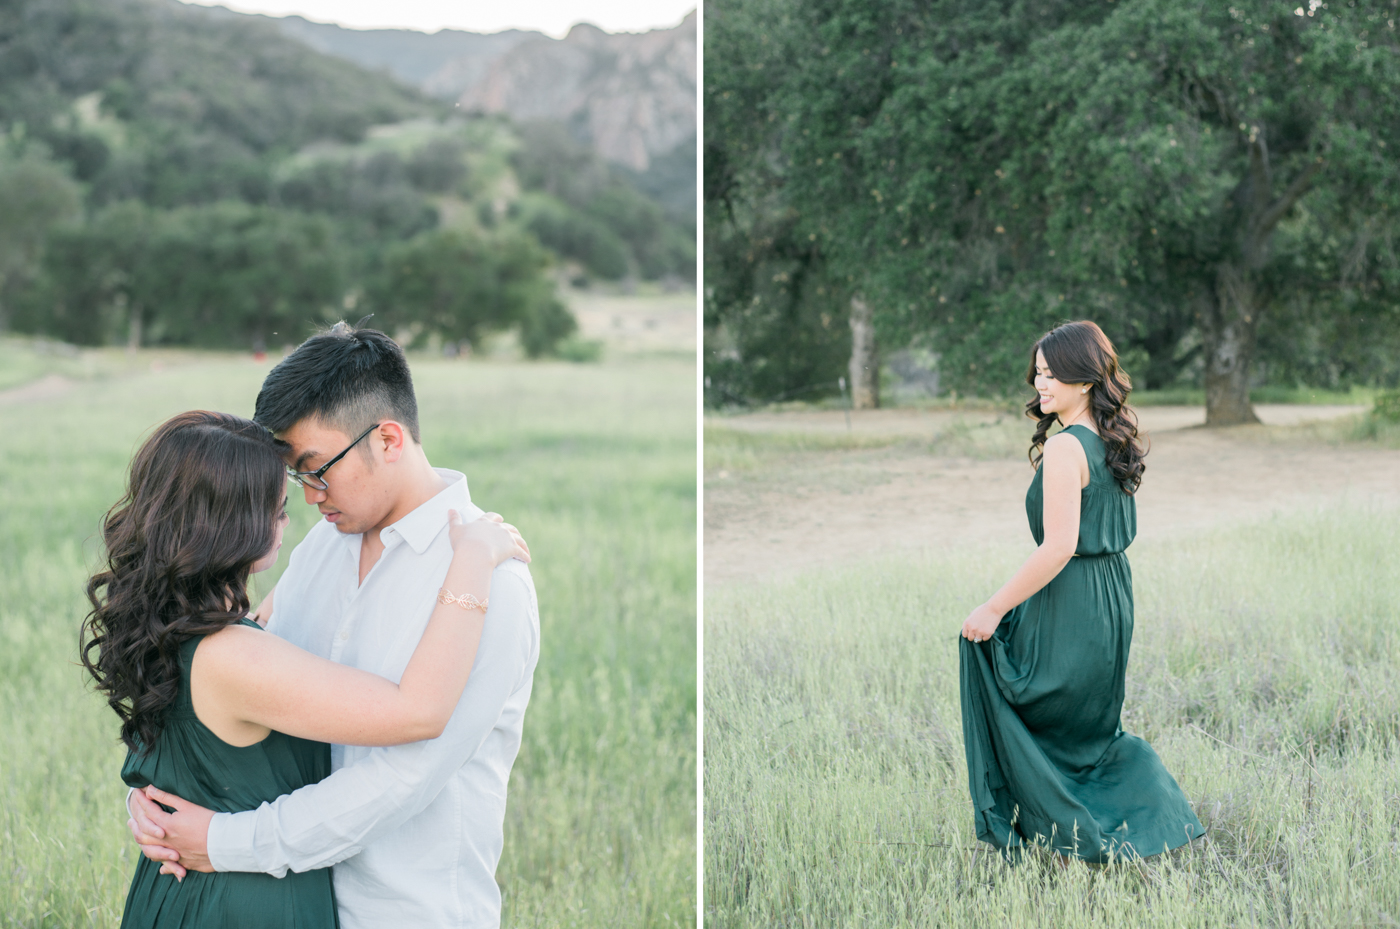 dianne&christian-malibu-creek-state-park-engagement-session-photography-los-angeles-based-wedding-photographer-18.jpg